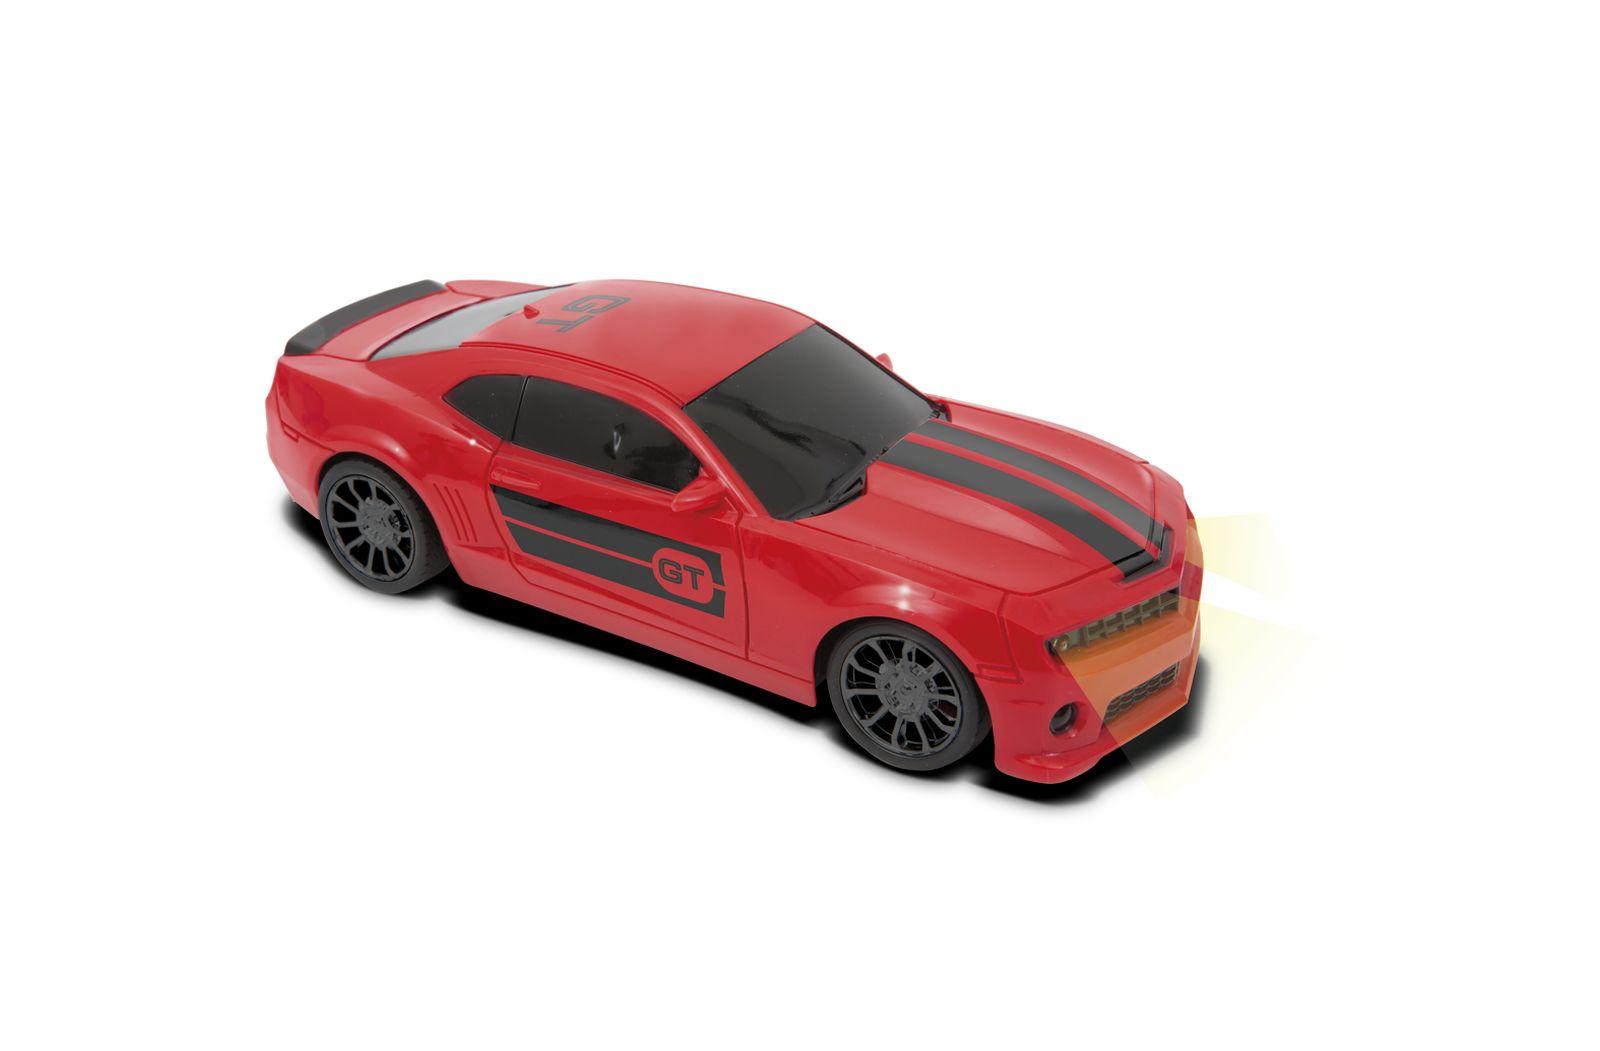 Auto r/c x-tuning car - MOTOR & CO.